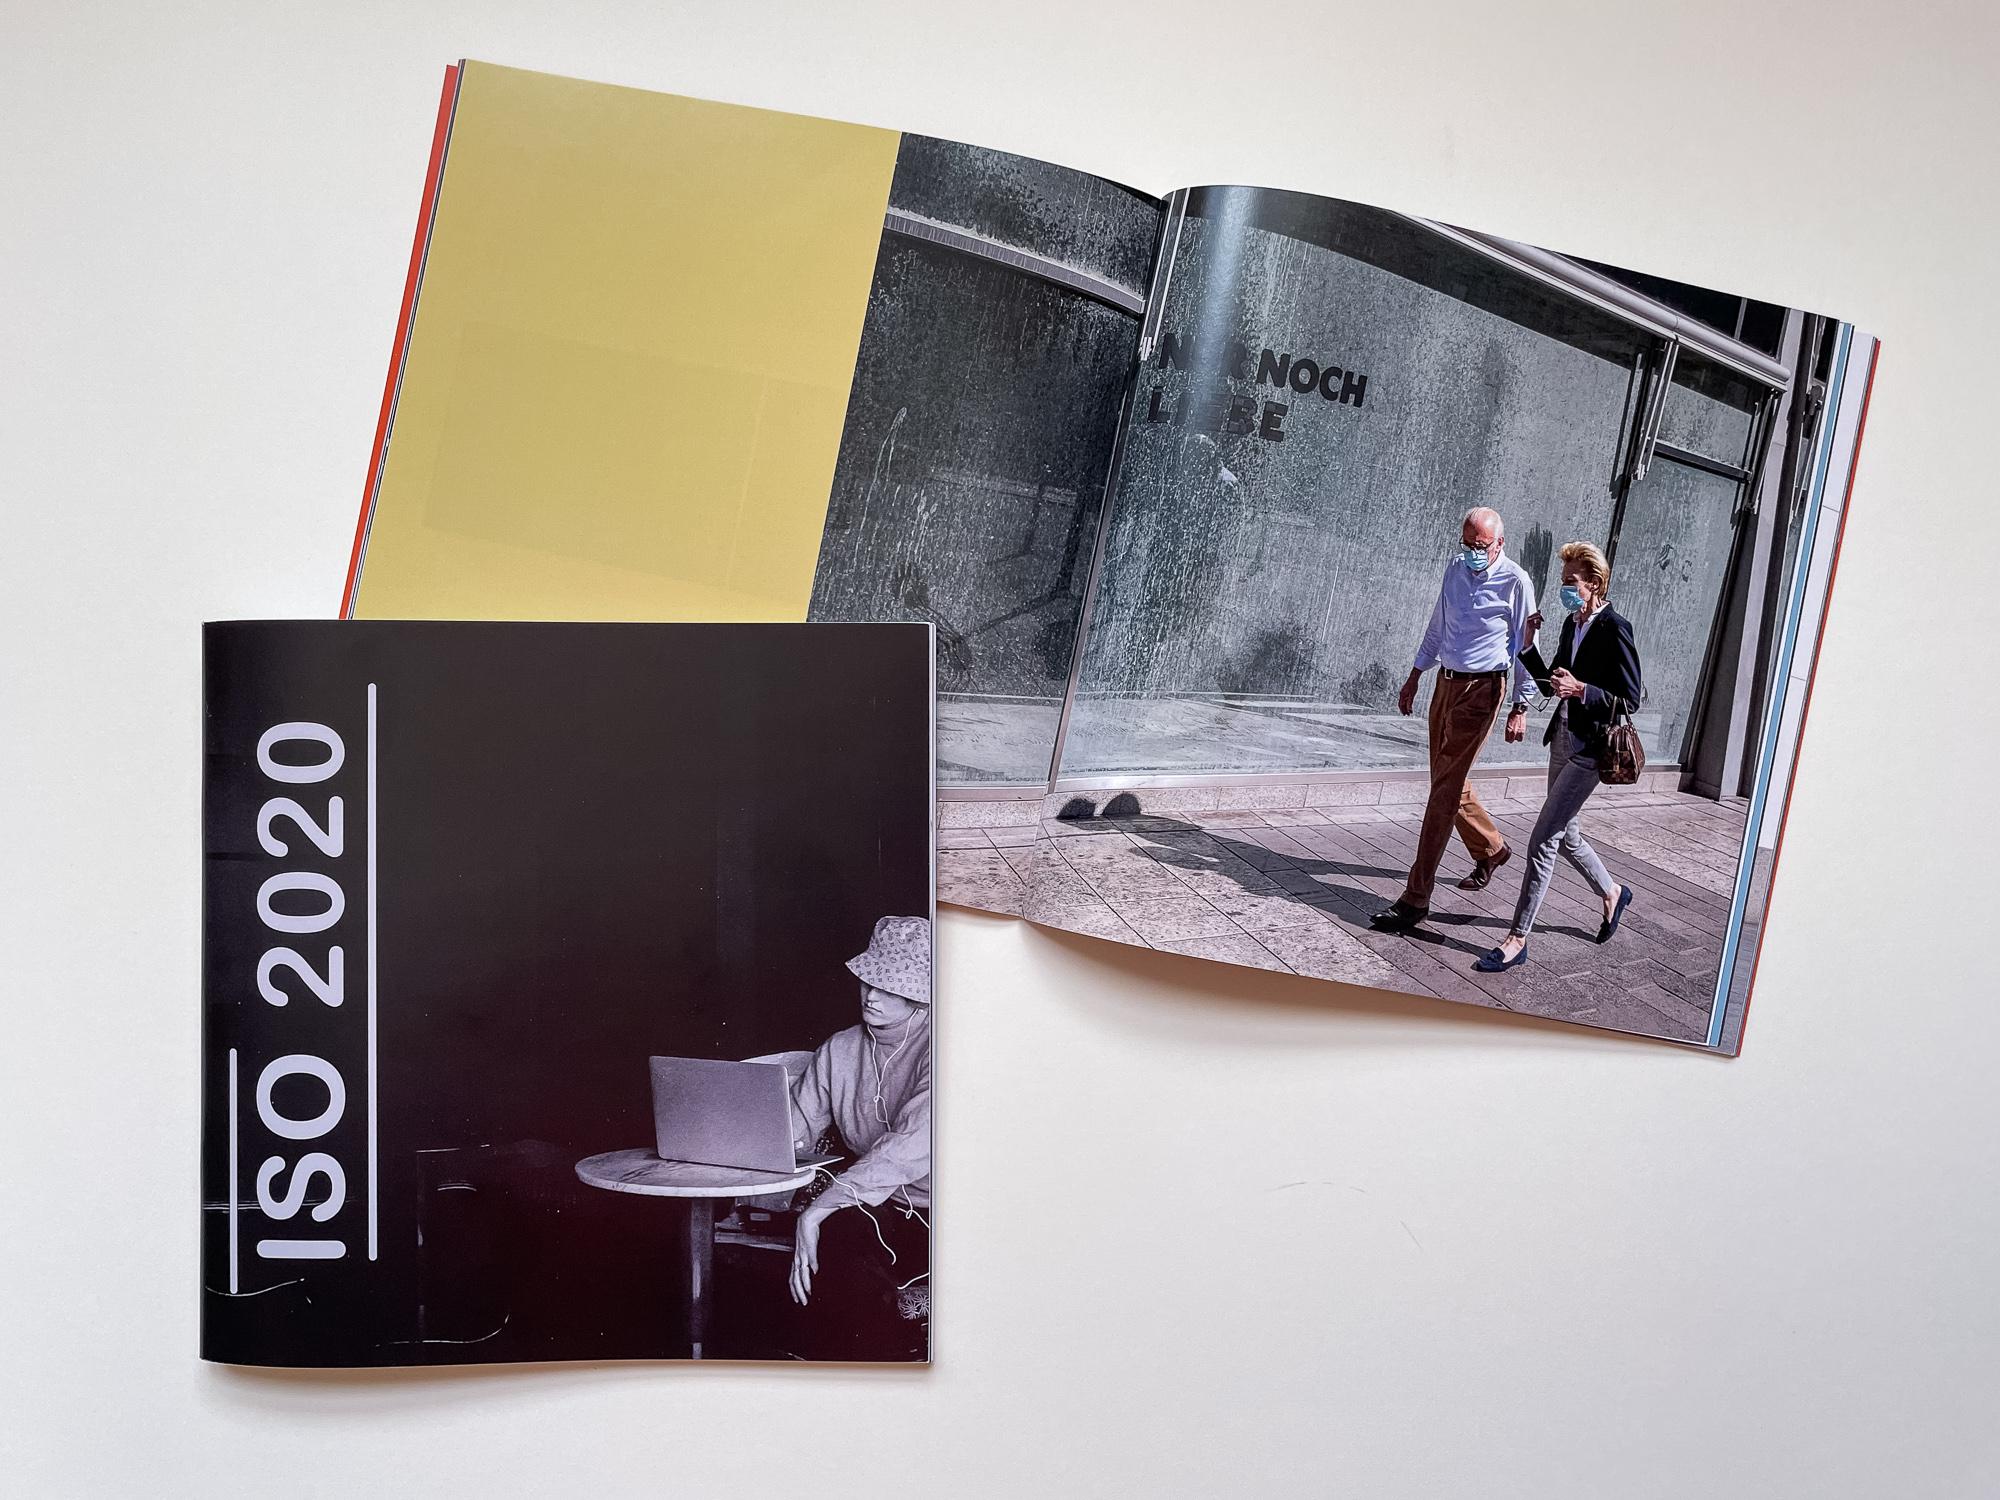 querformat-fotografie - Achim Katzberg - BiG CiTY LiFE - querformat-fotografie_IO2020-002